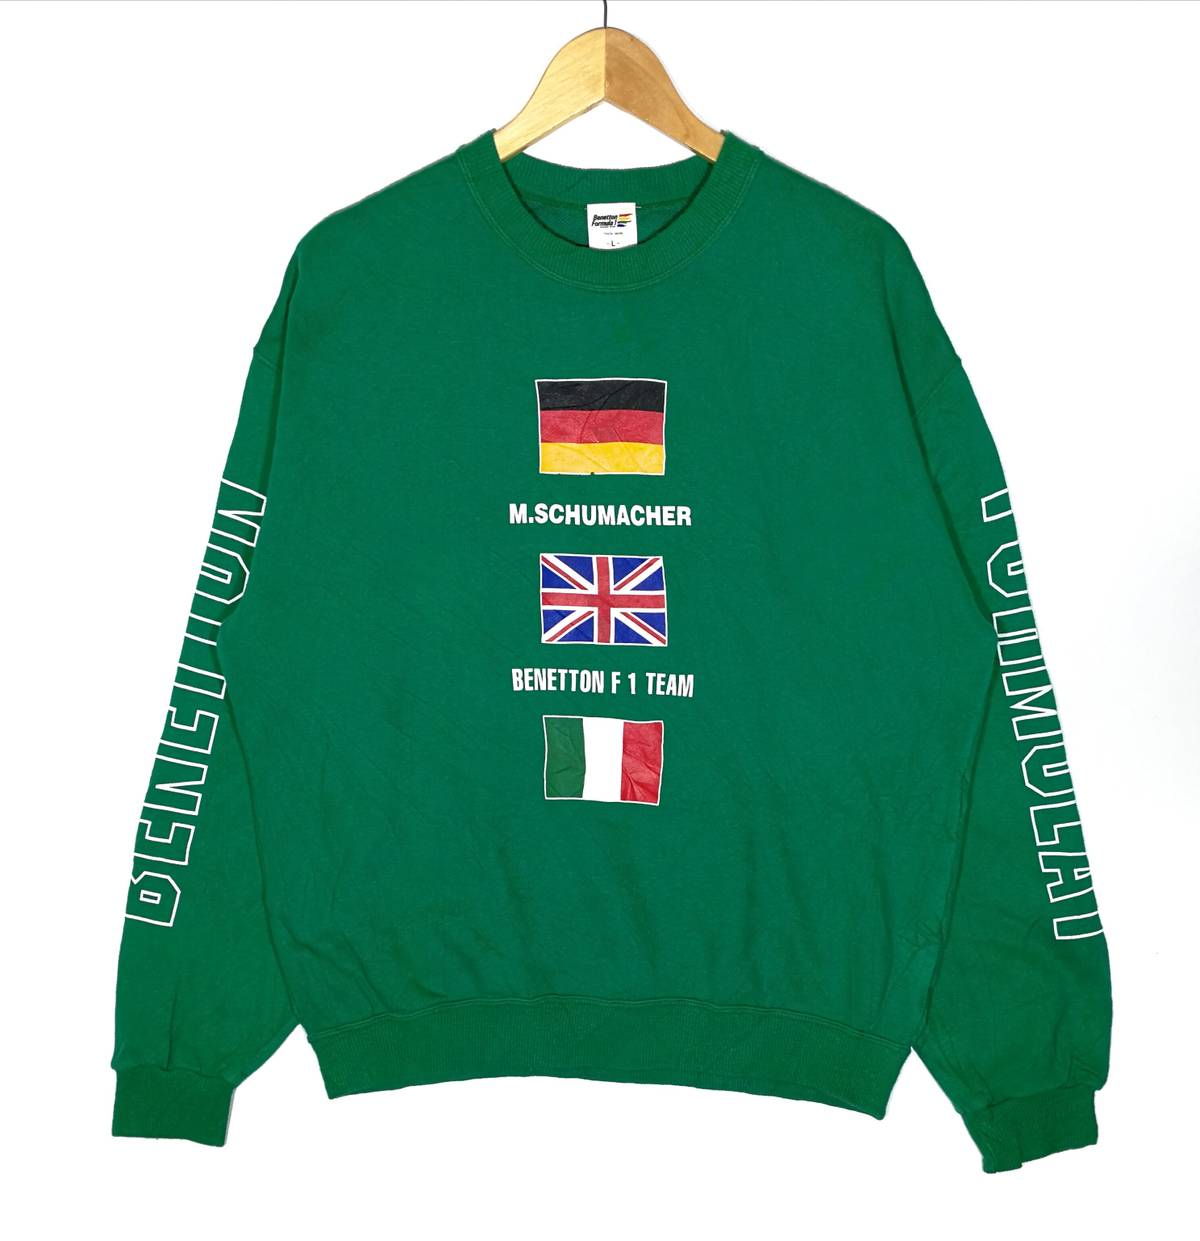 Hot Item!! vintage Benetton Sweatshirt Big Logo Size Large Benetton Formula 1 Activewear Streetswear Very Good Condition